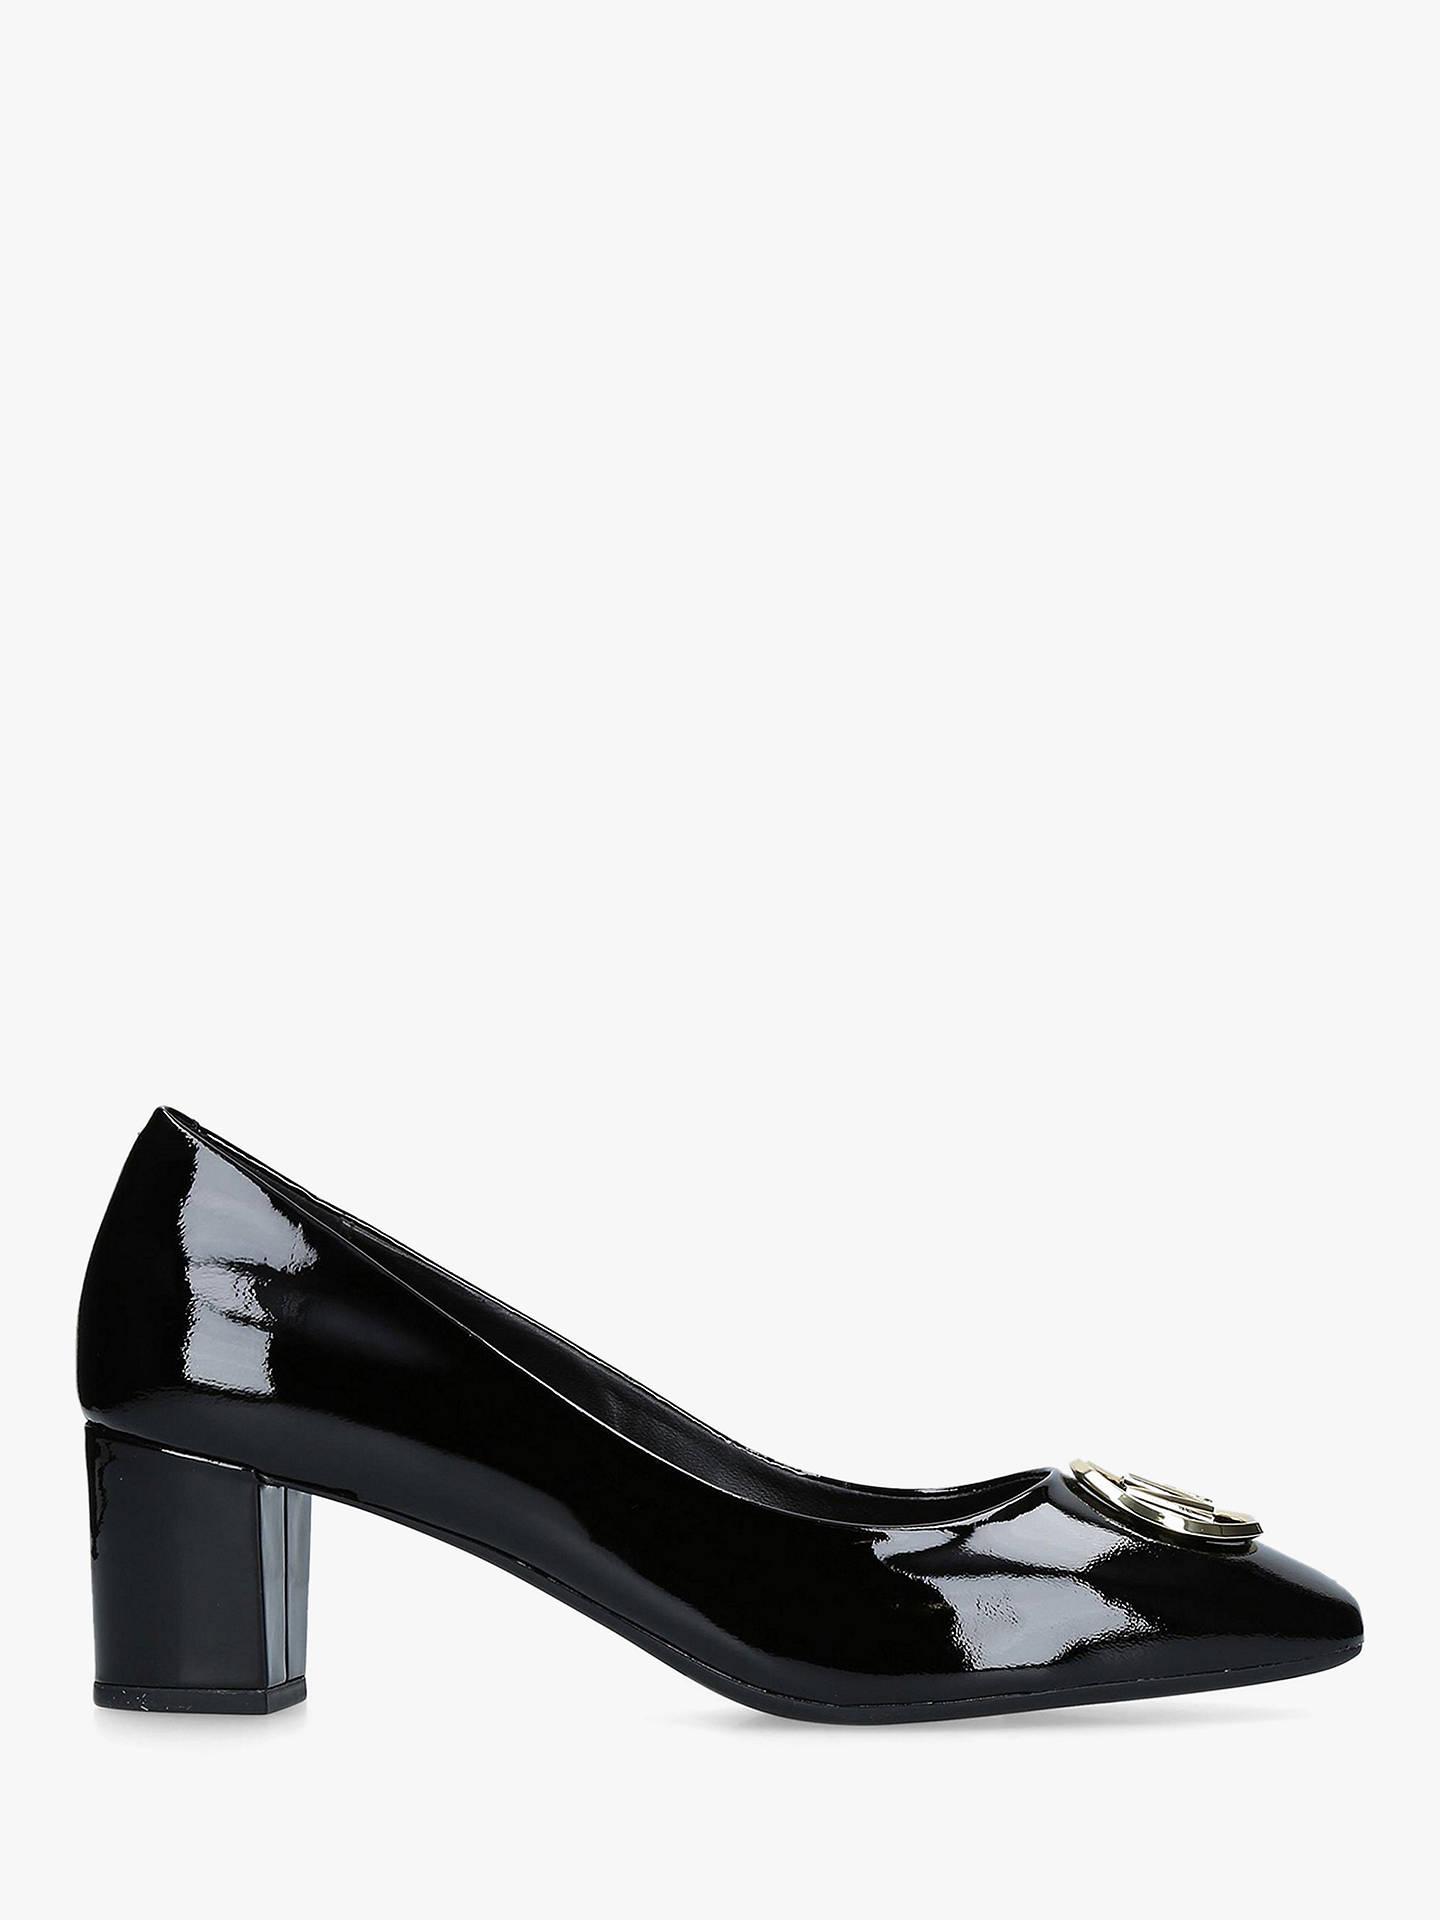 229a2075a07 Buy MICHAEL Michael Kors Dena Block Heel Court Shoes